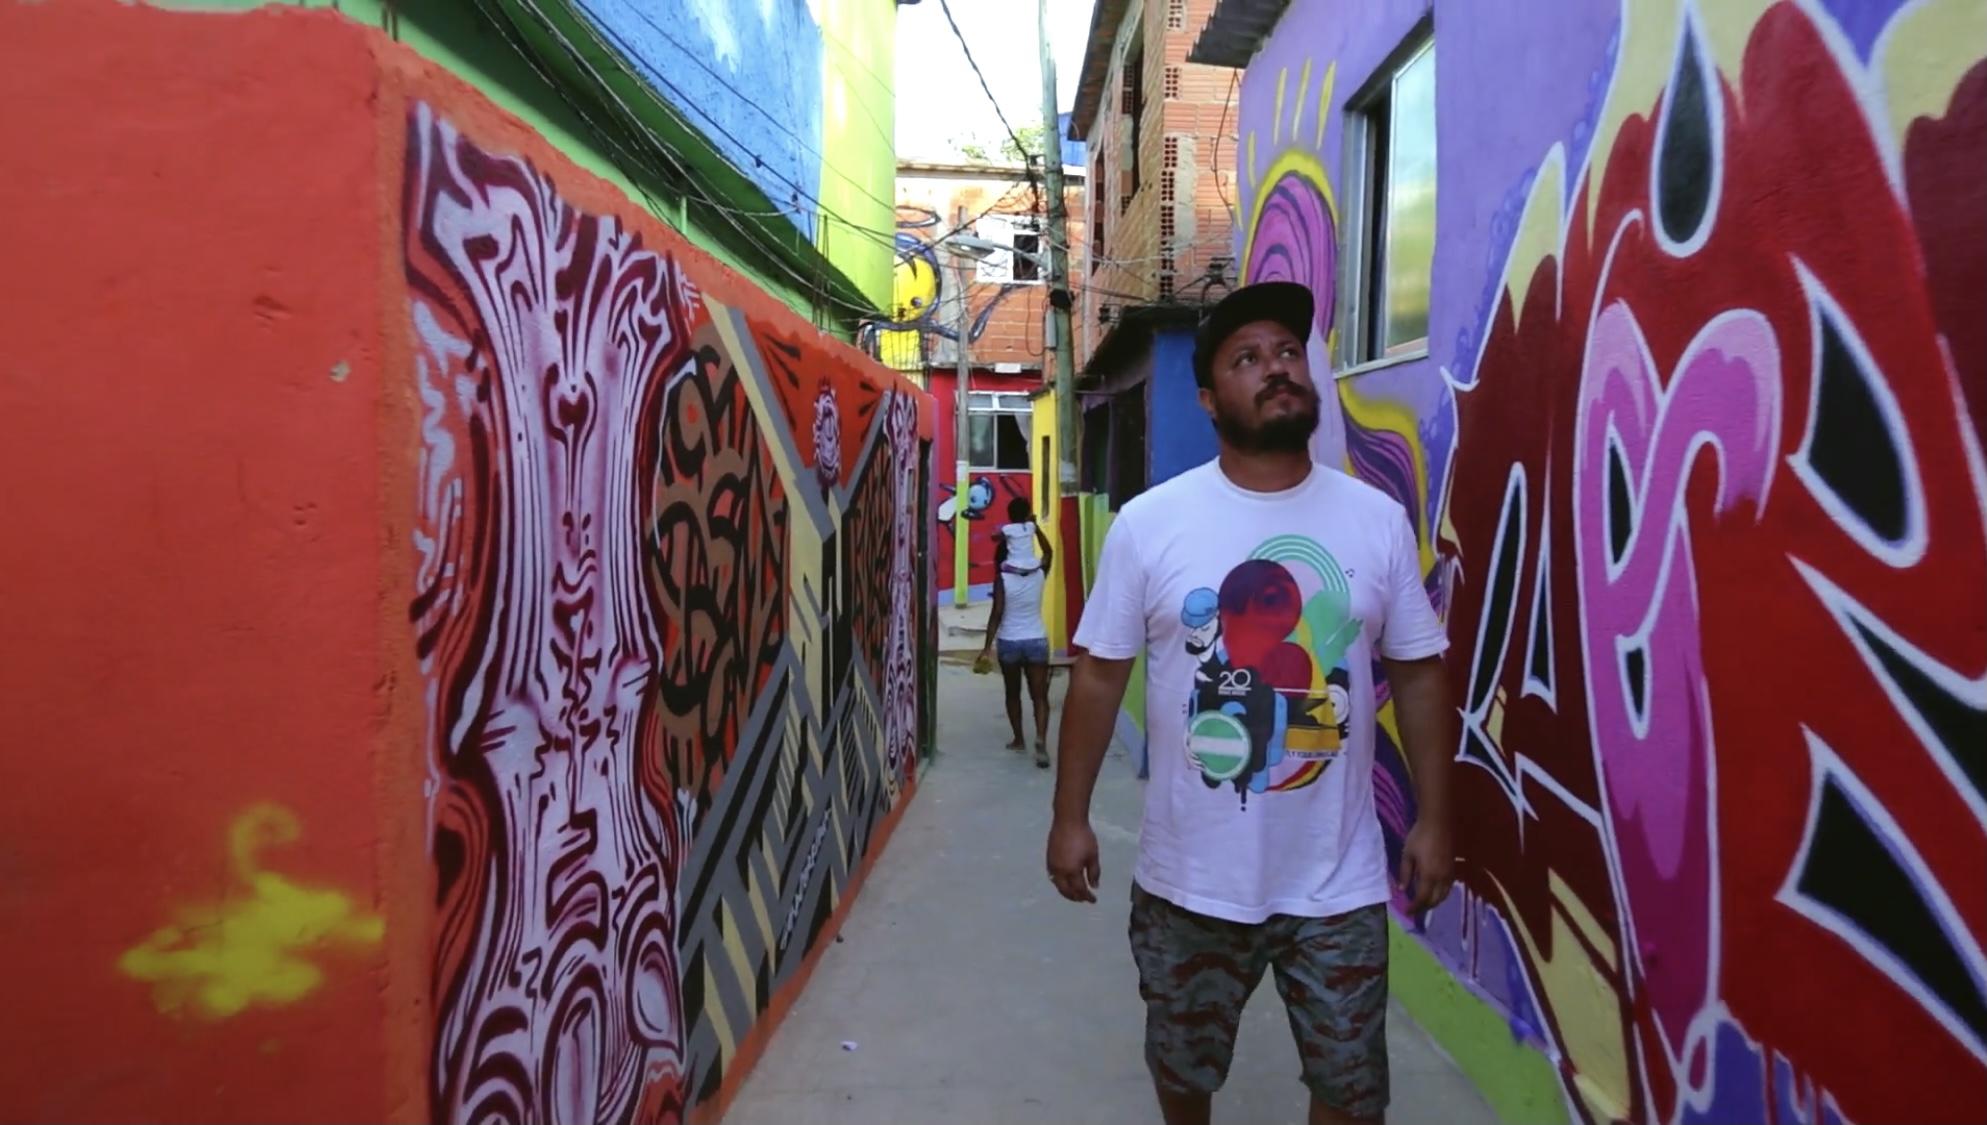 Revitaliza Graffiti